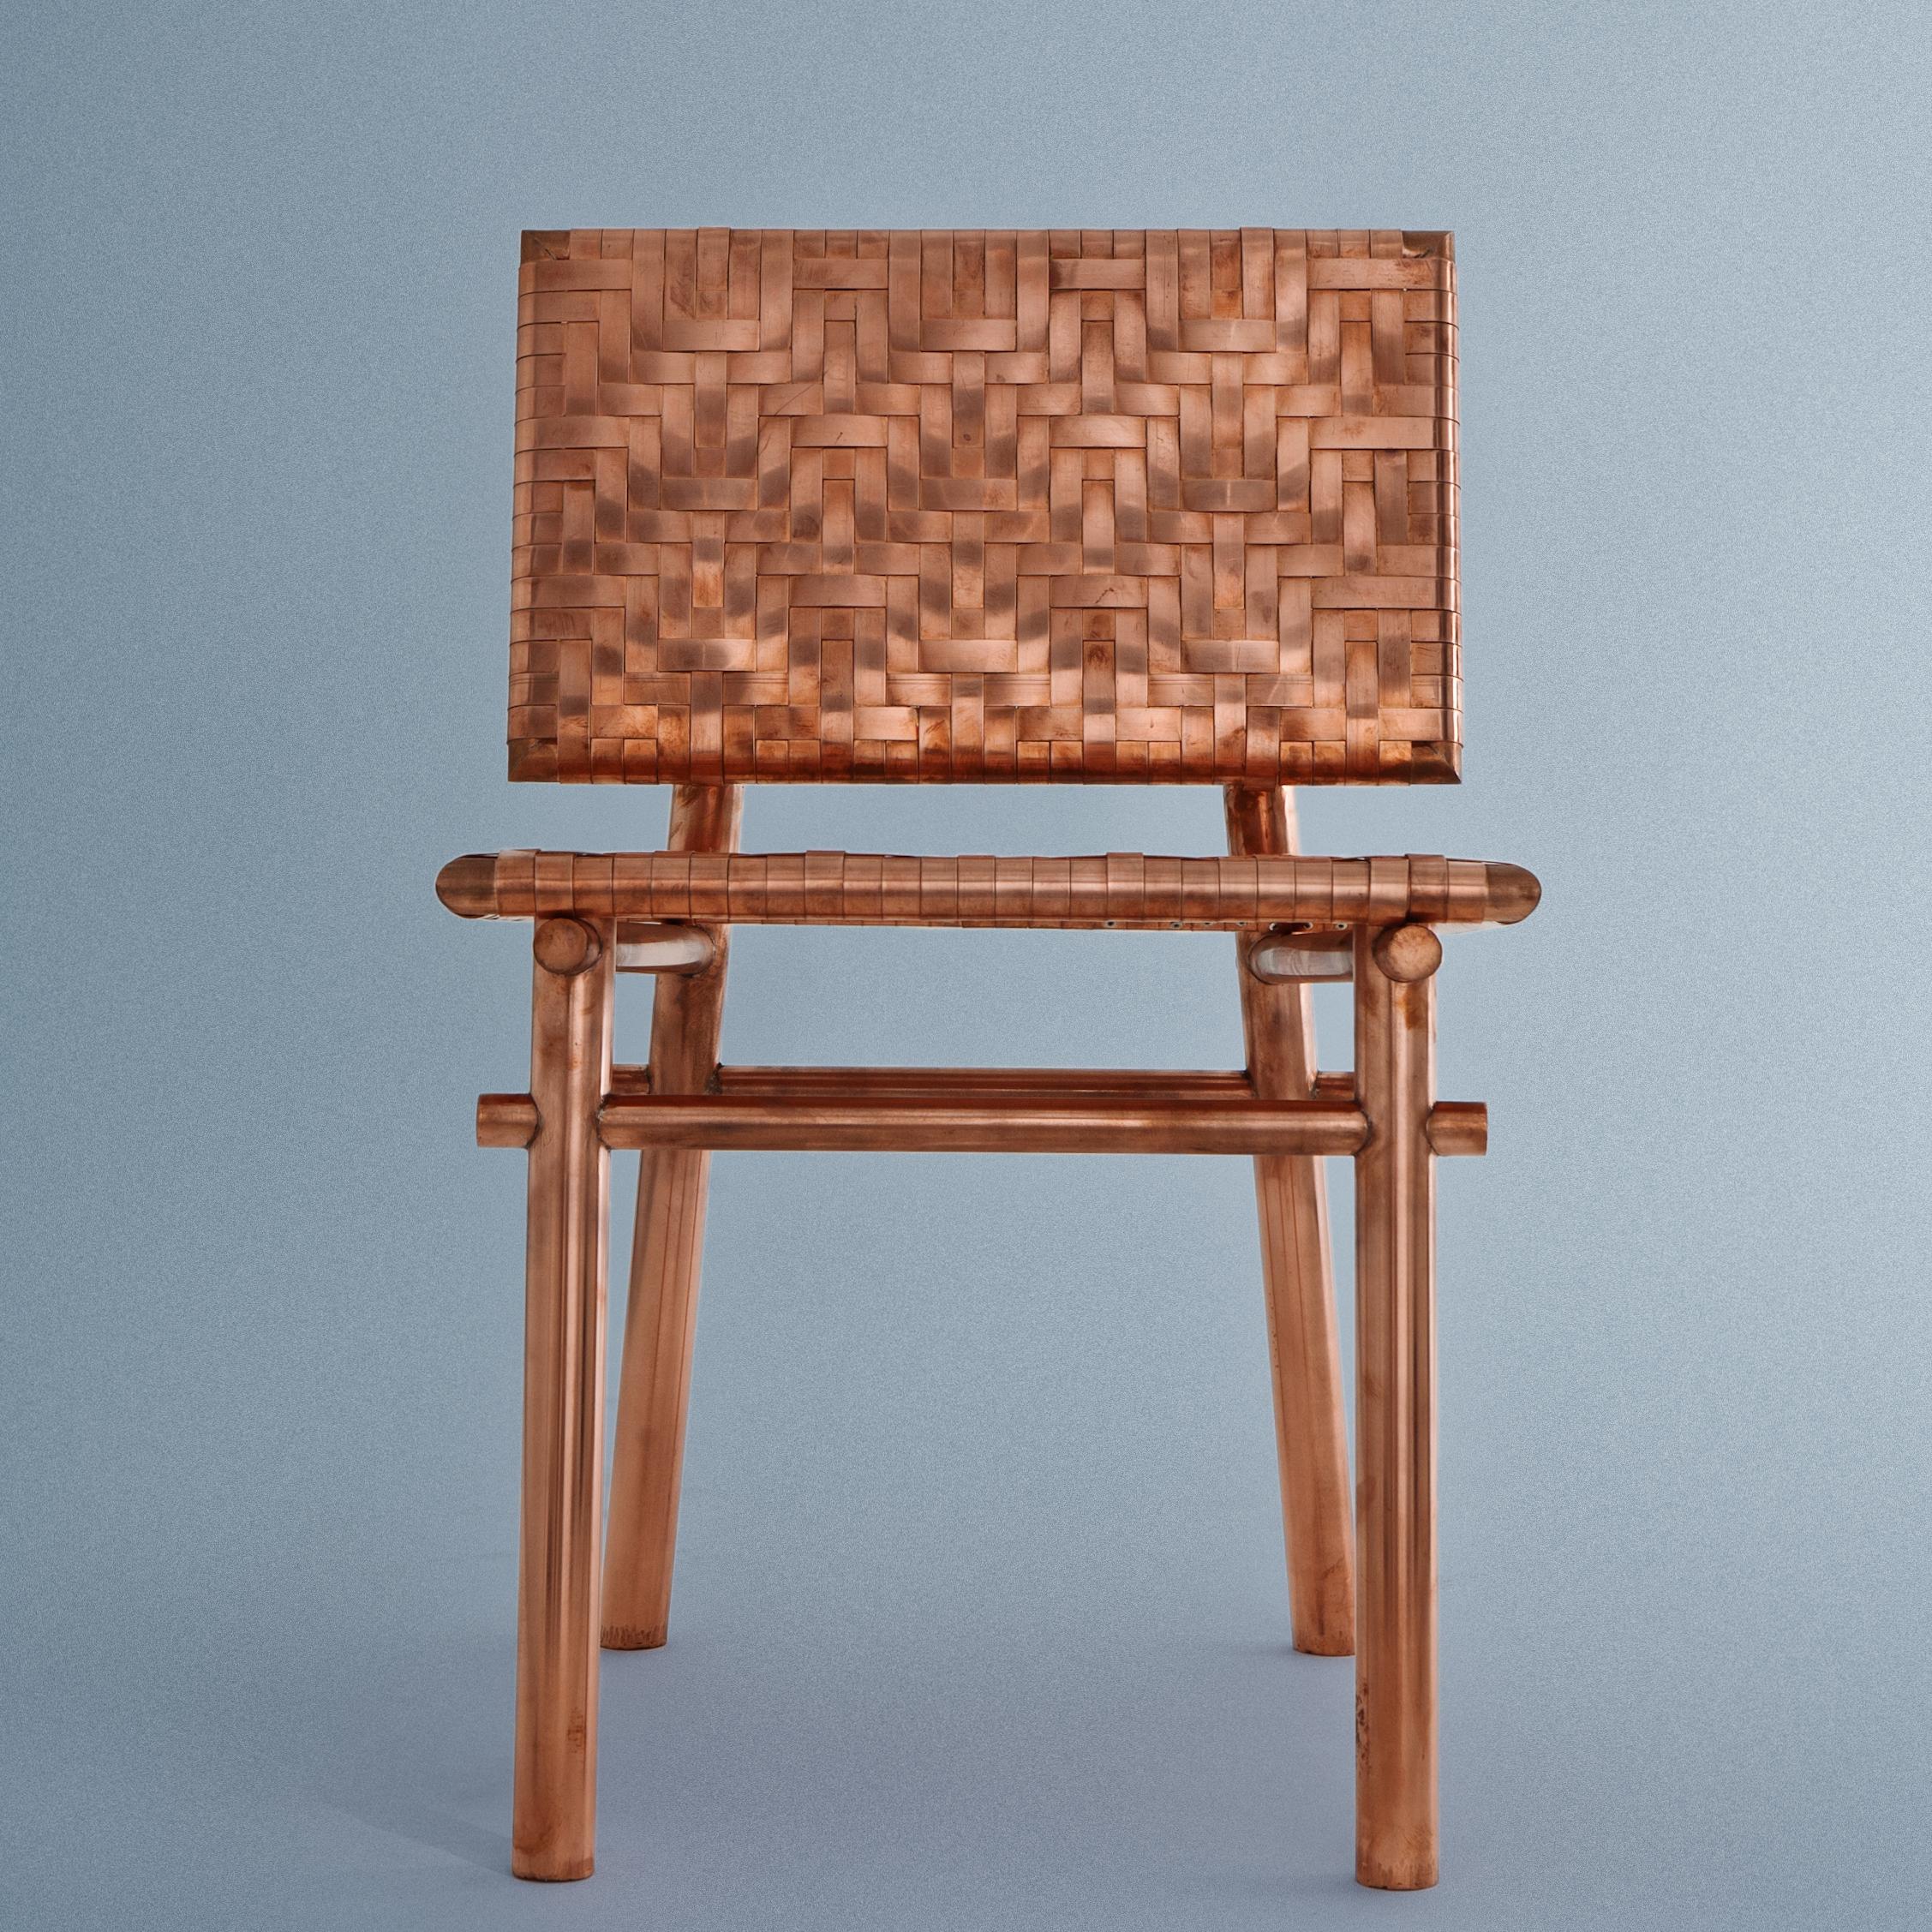 gittings_michael_Rec_Rec_Chair_image_product_hires1.jpg